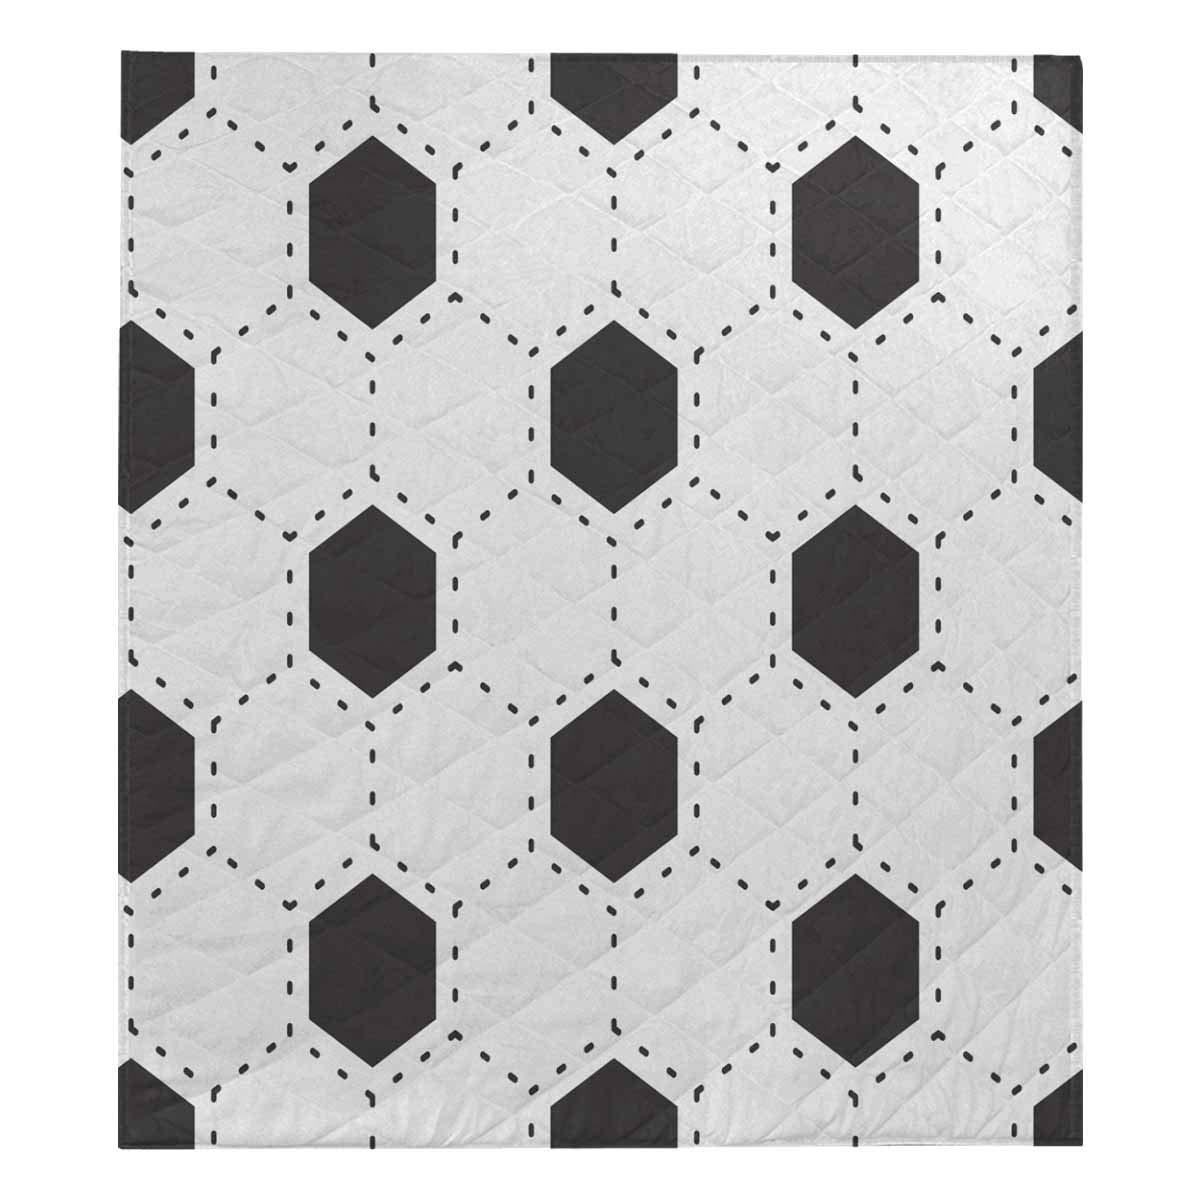 Soccer Quilt Patterns Free Quilt Patterns